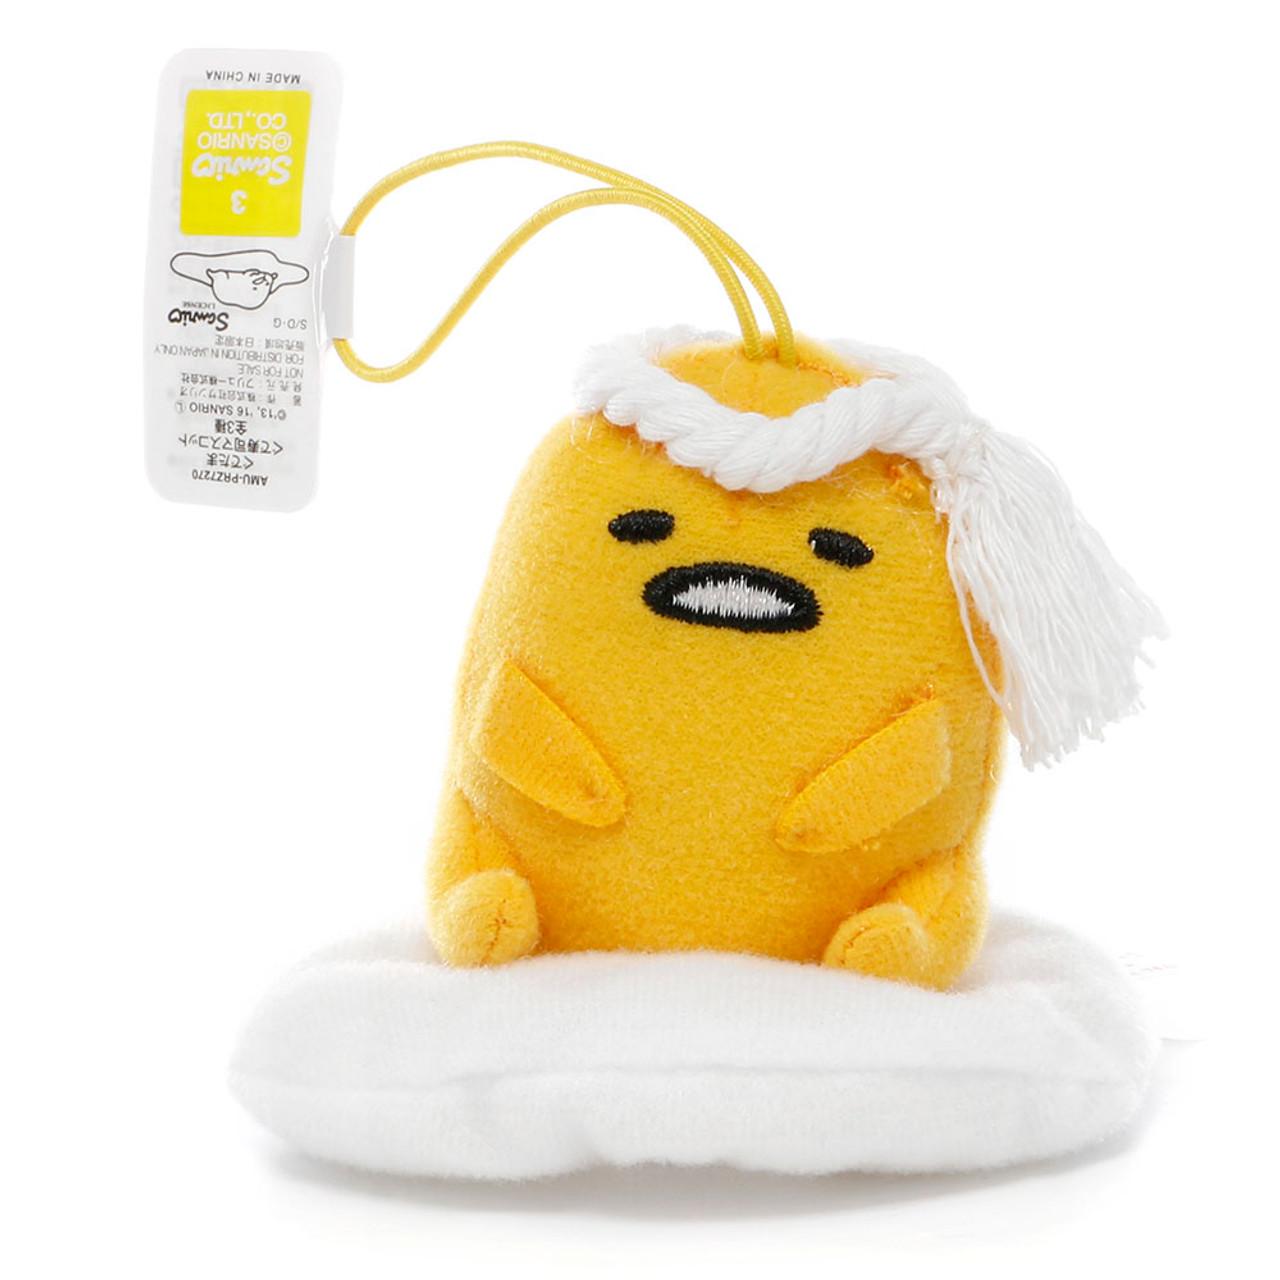 Sanrio Gudetama Lazy Egg Sushi Mascot Plush Charms - Chef ( Front View )